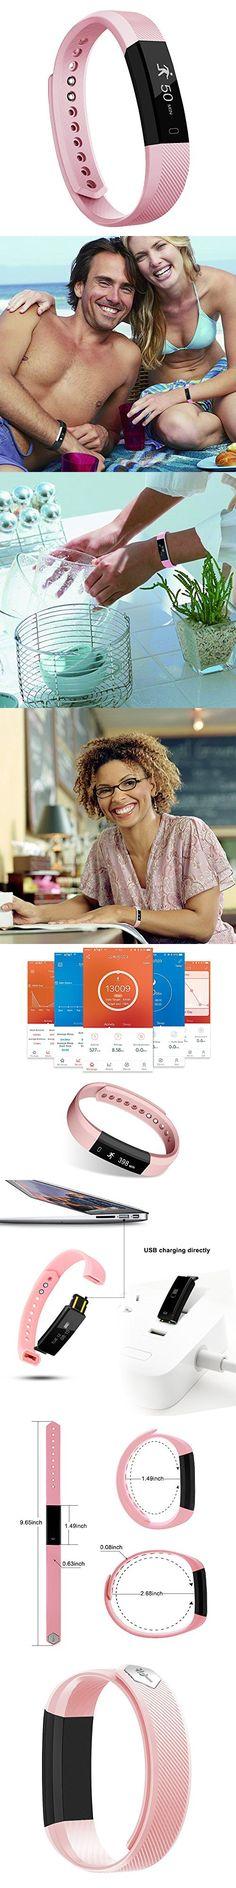 Fitness Tracker, MoreFit Slim Touch Screen Activity Health Tracker Wearable Pedometer Smart Wristband, Black/ Blush